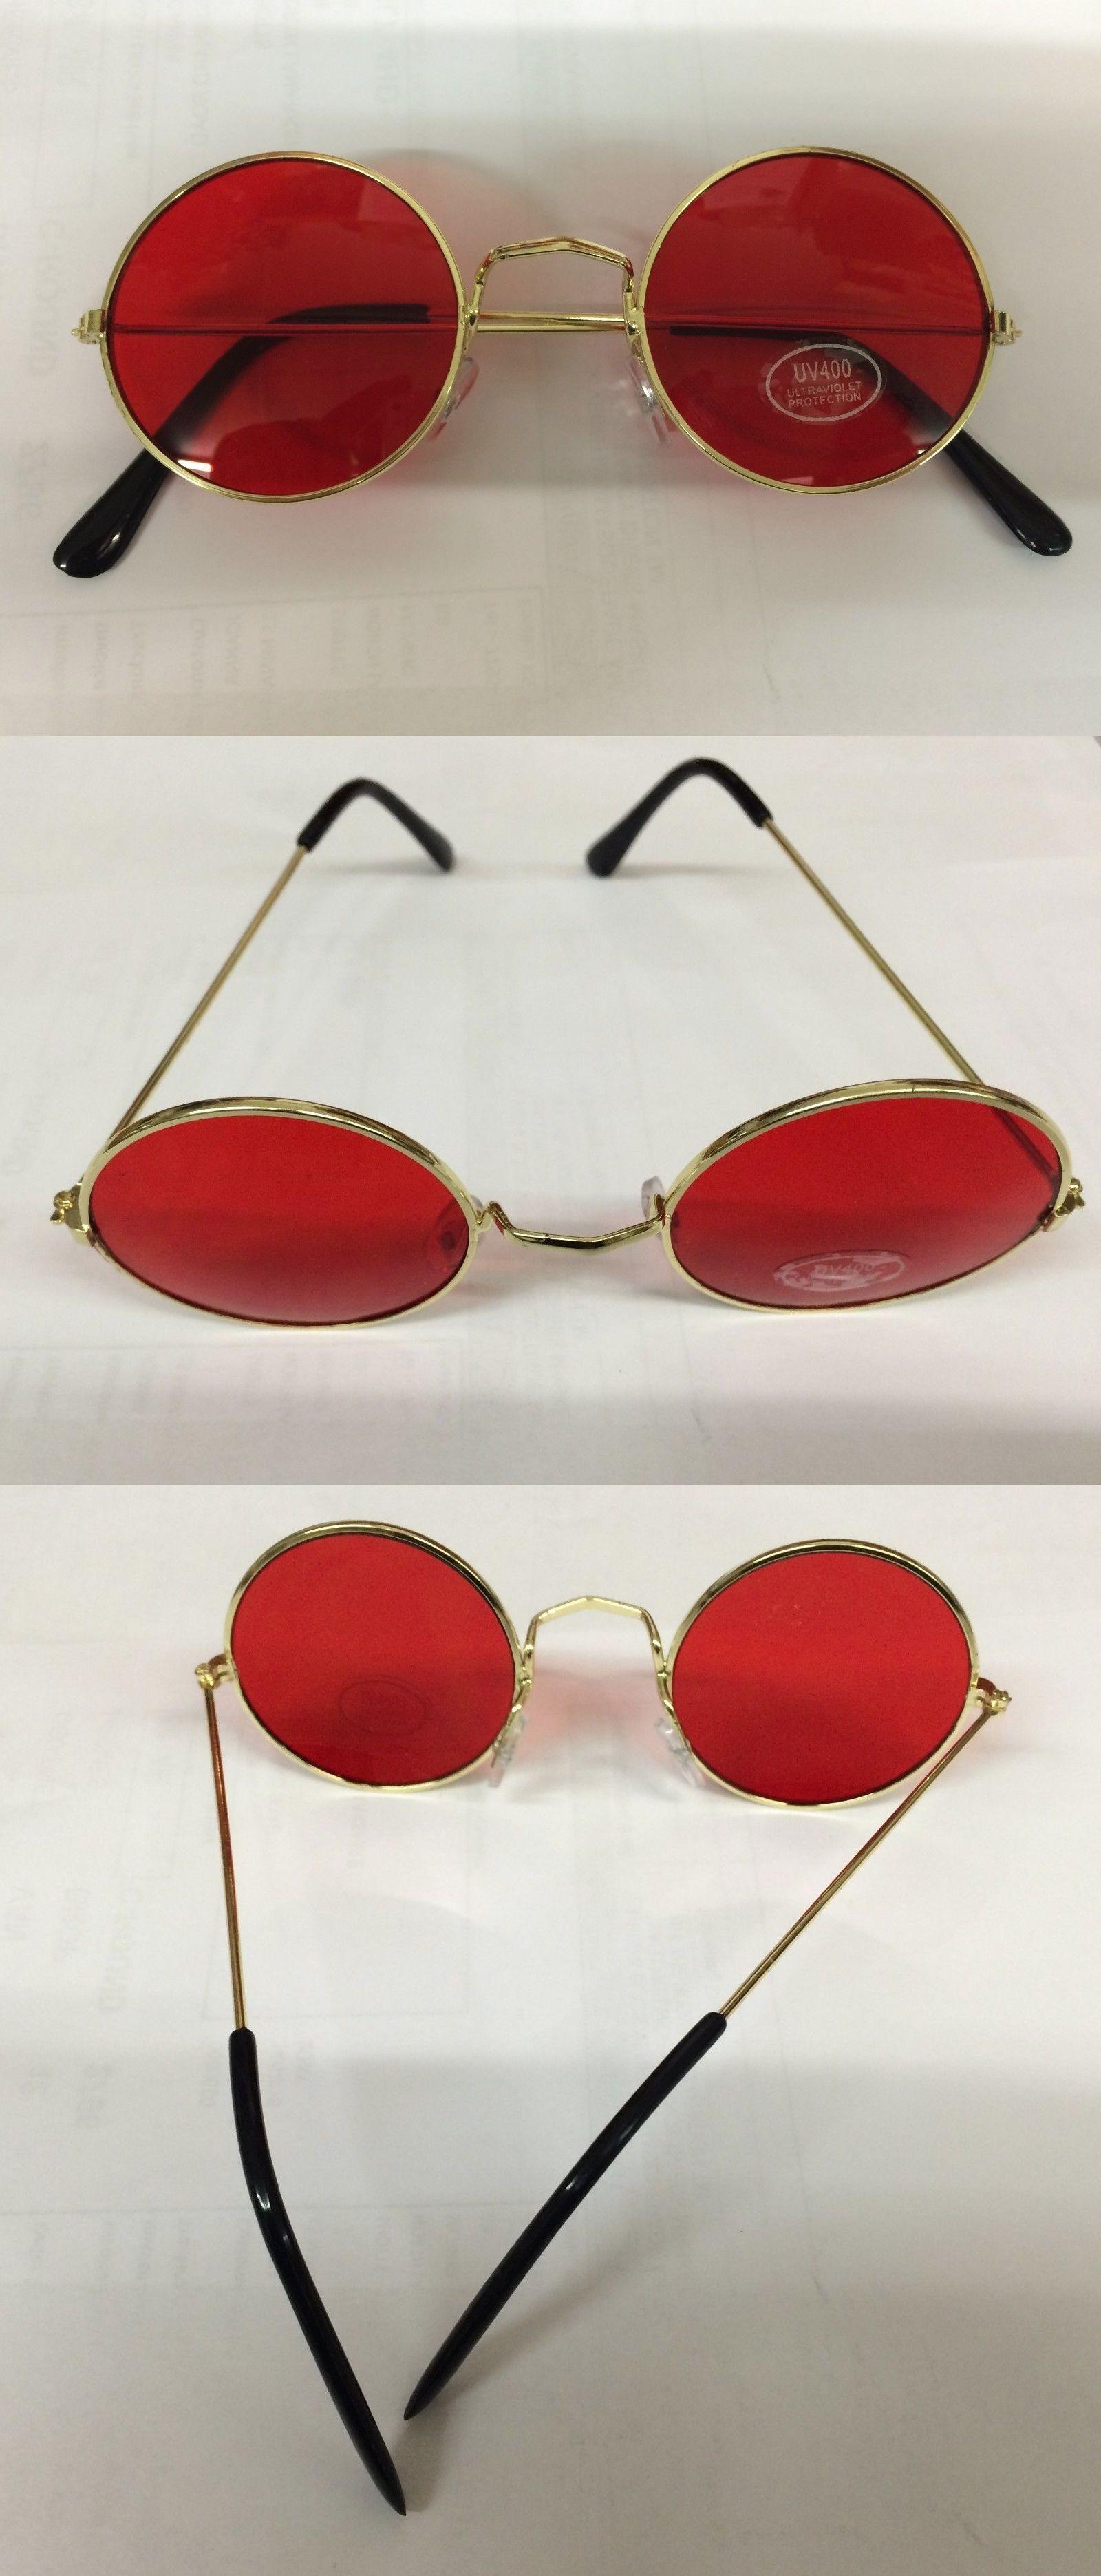 d0dab114fd6 Glasses 175646  John Lennon Style Red Sunglasses Woody Harrelson Natural  Born Killers Glasses -  BUY IT NOW ONLY   14.41 on  eBay  glasses  lennon   style ...